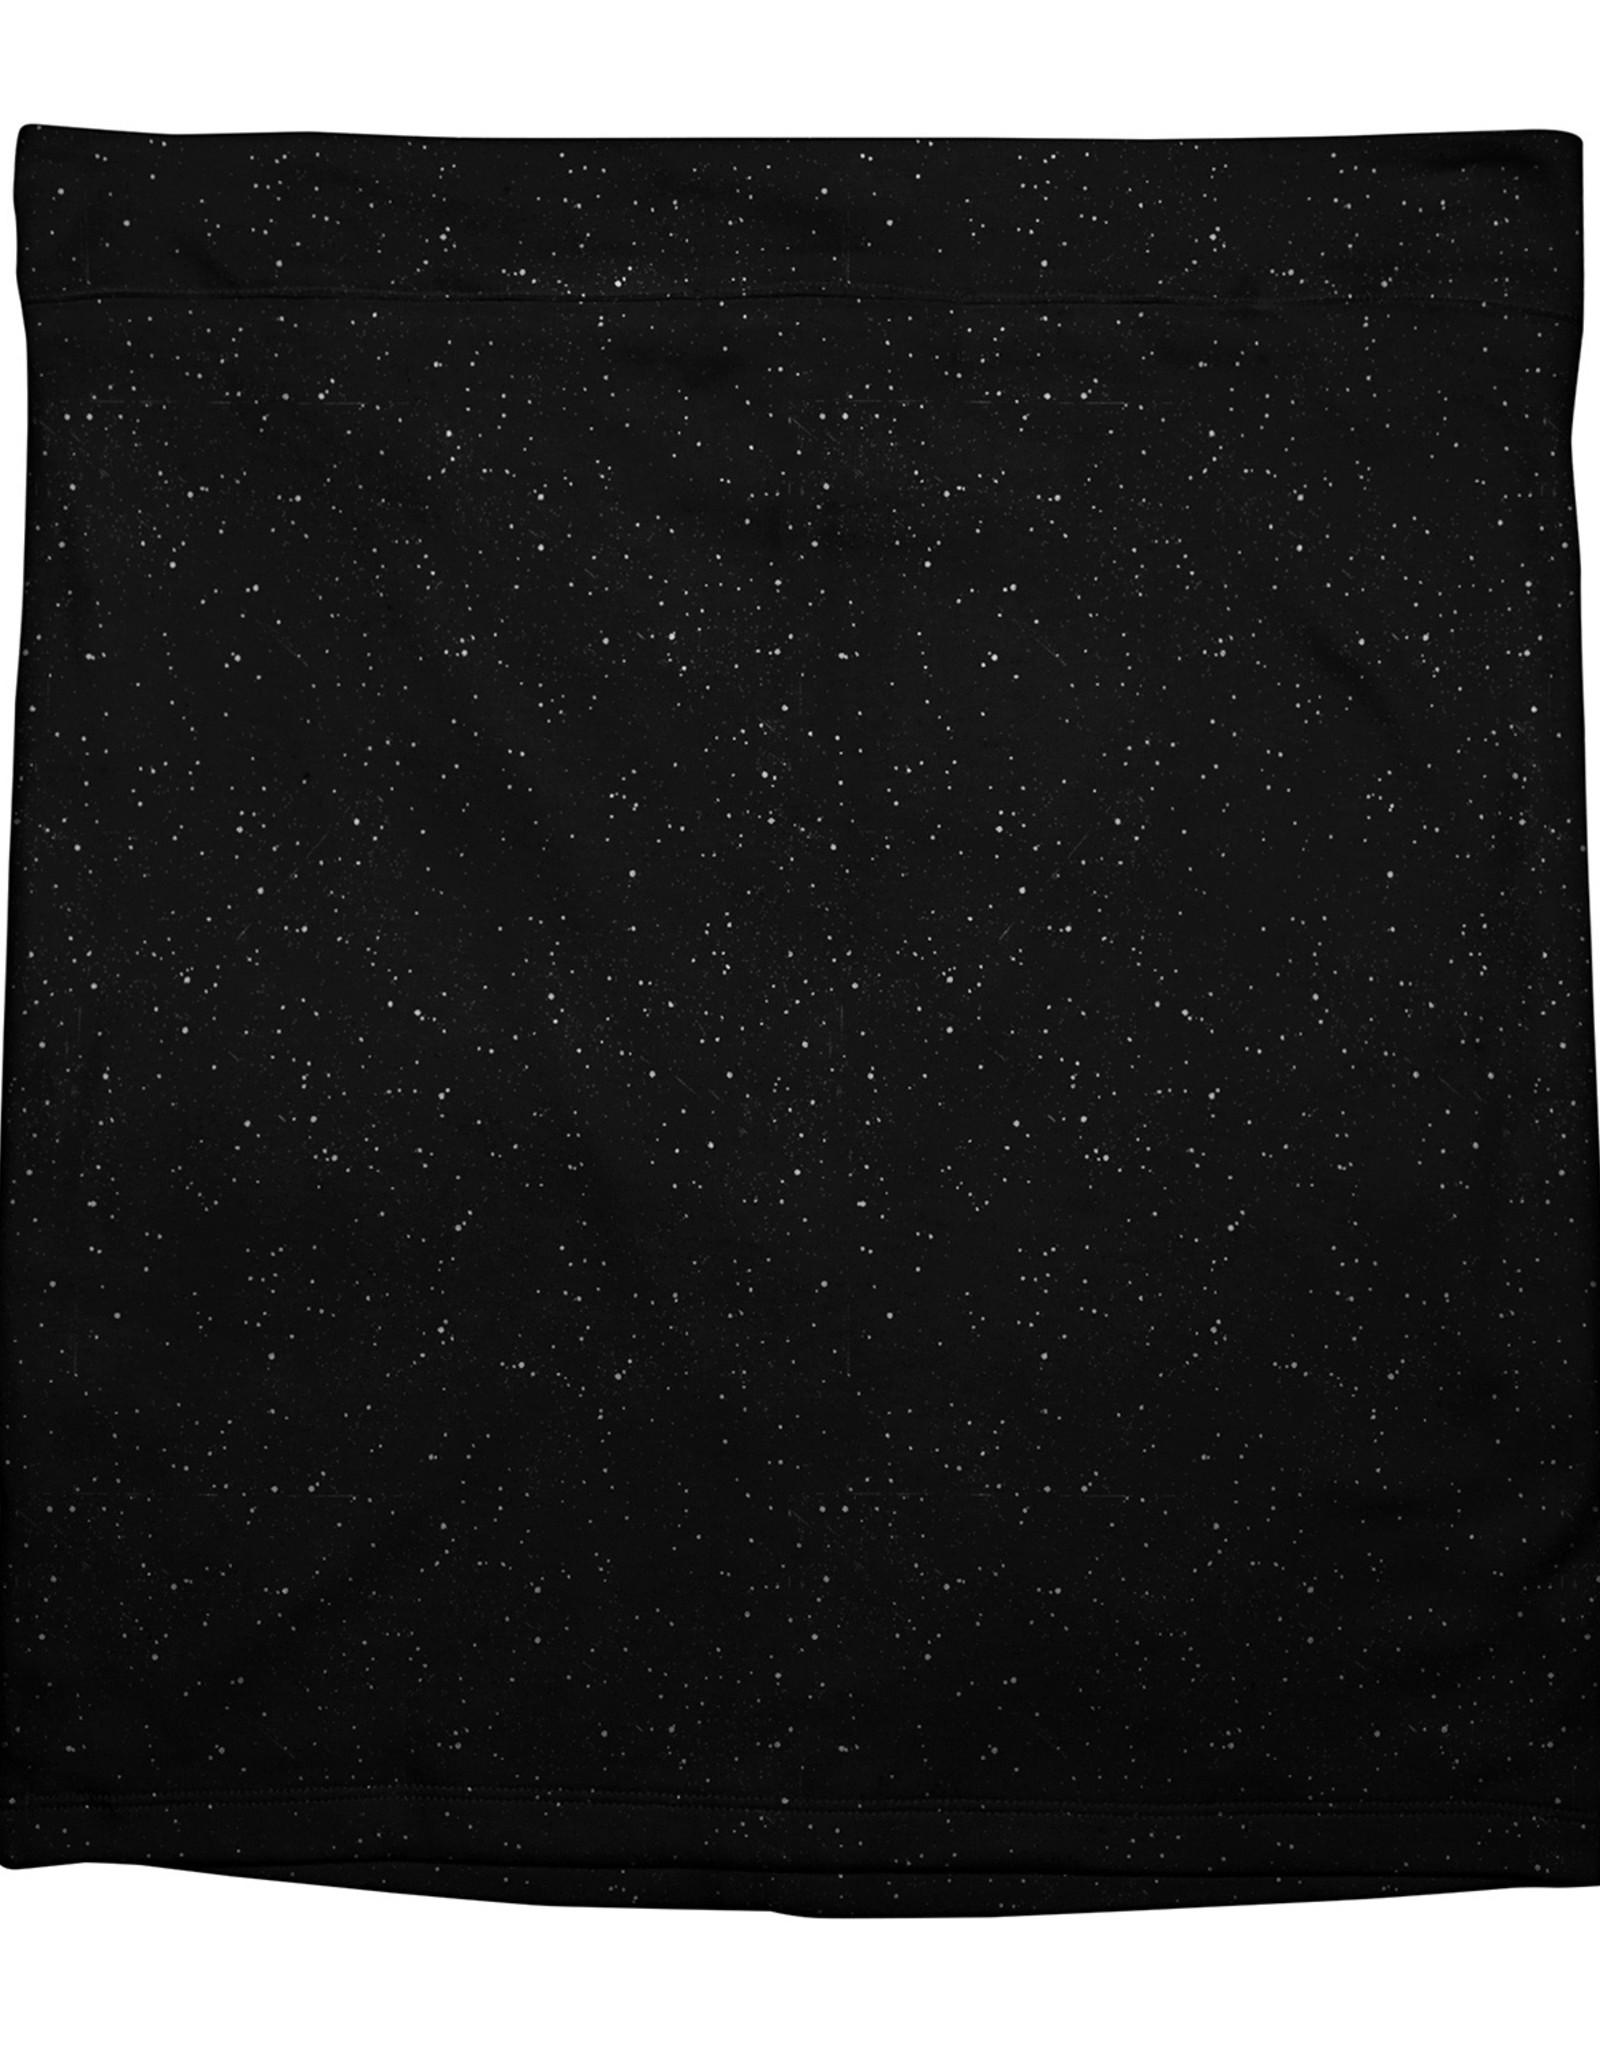 Dedicated ROK SPACE PRINT BLACK RIPA